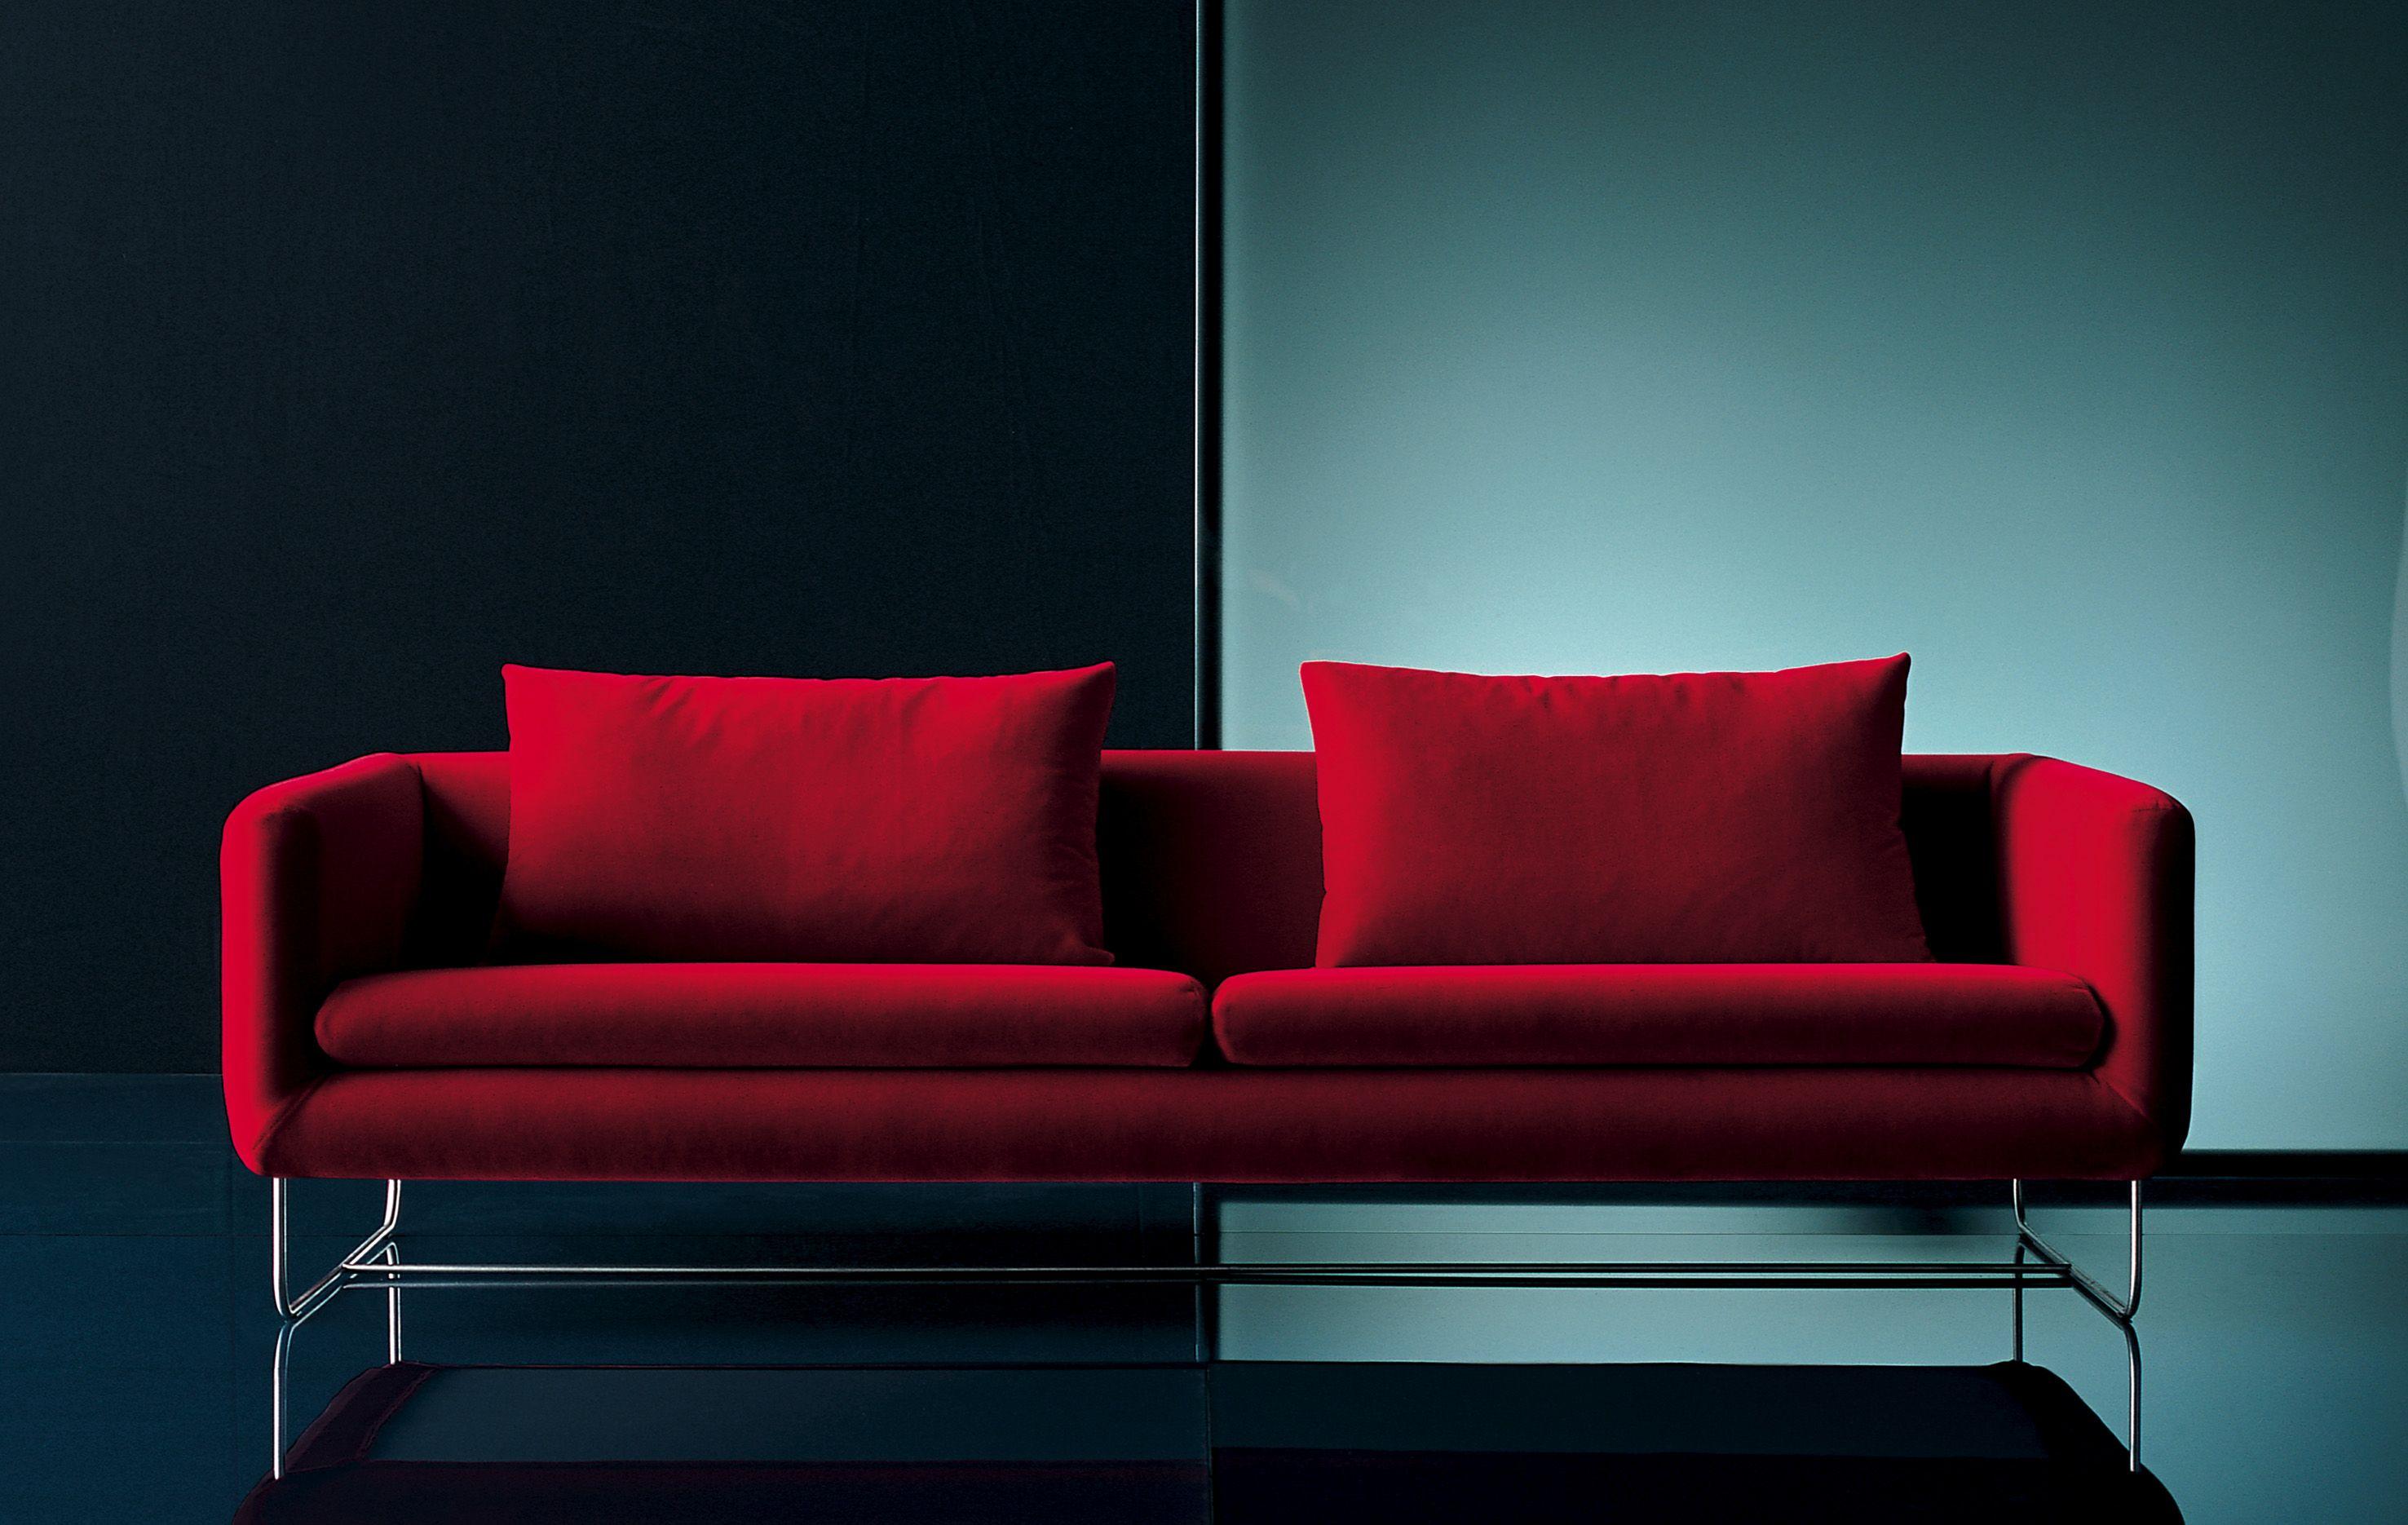 Best Avalon Sofa By Claesson Koivisto Rune For Living Divani 400 x 300